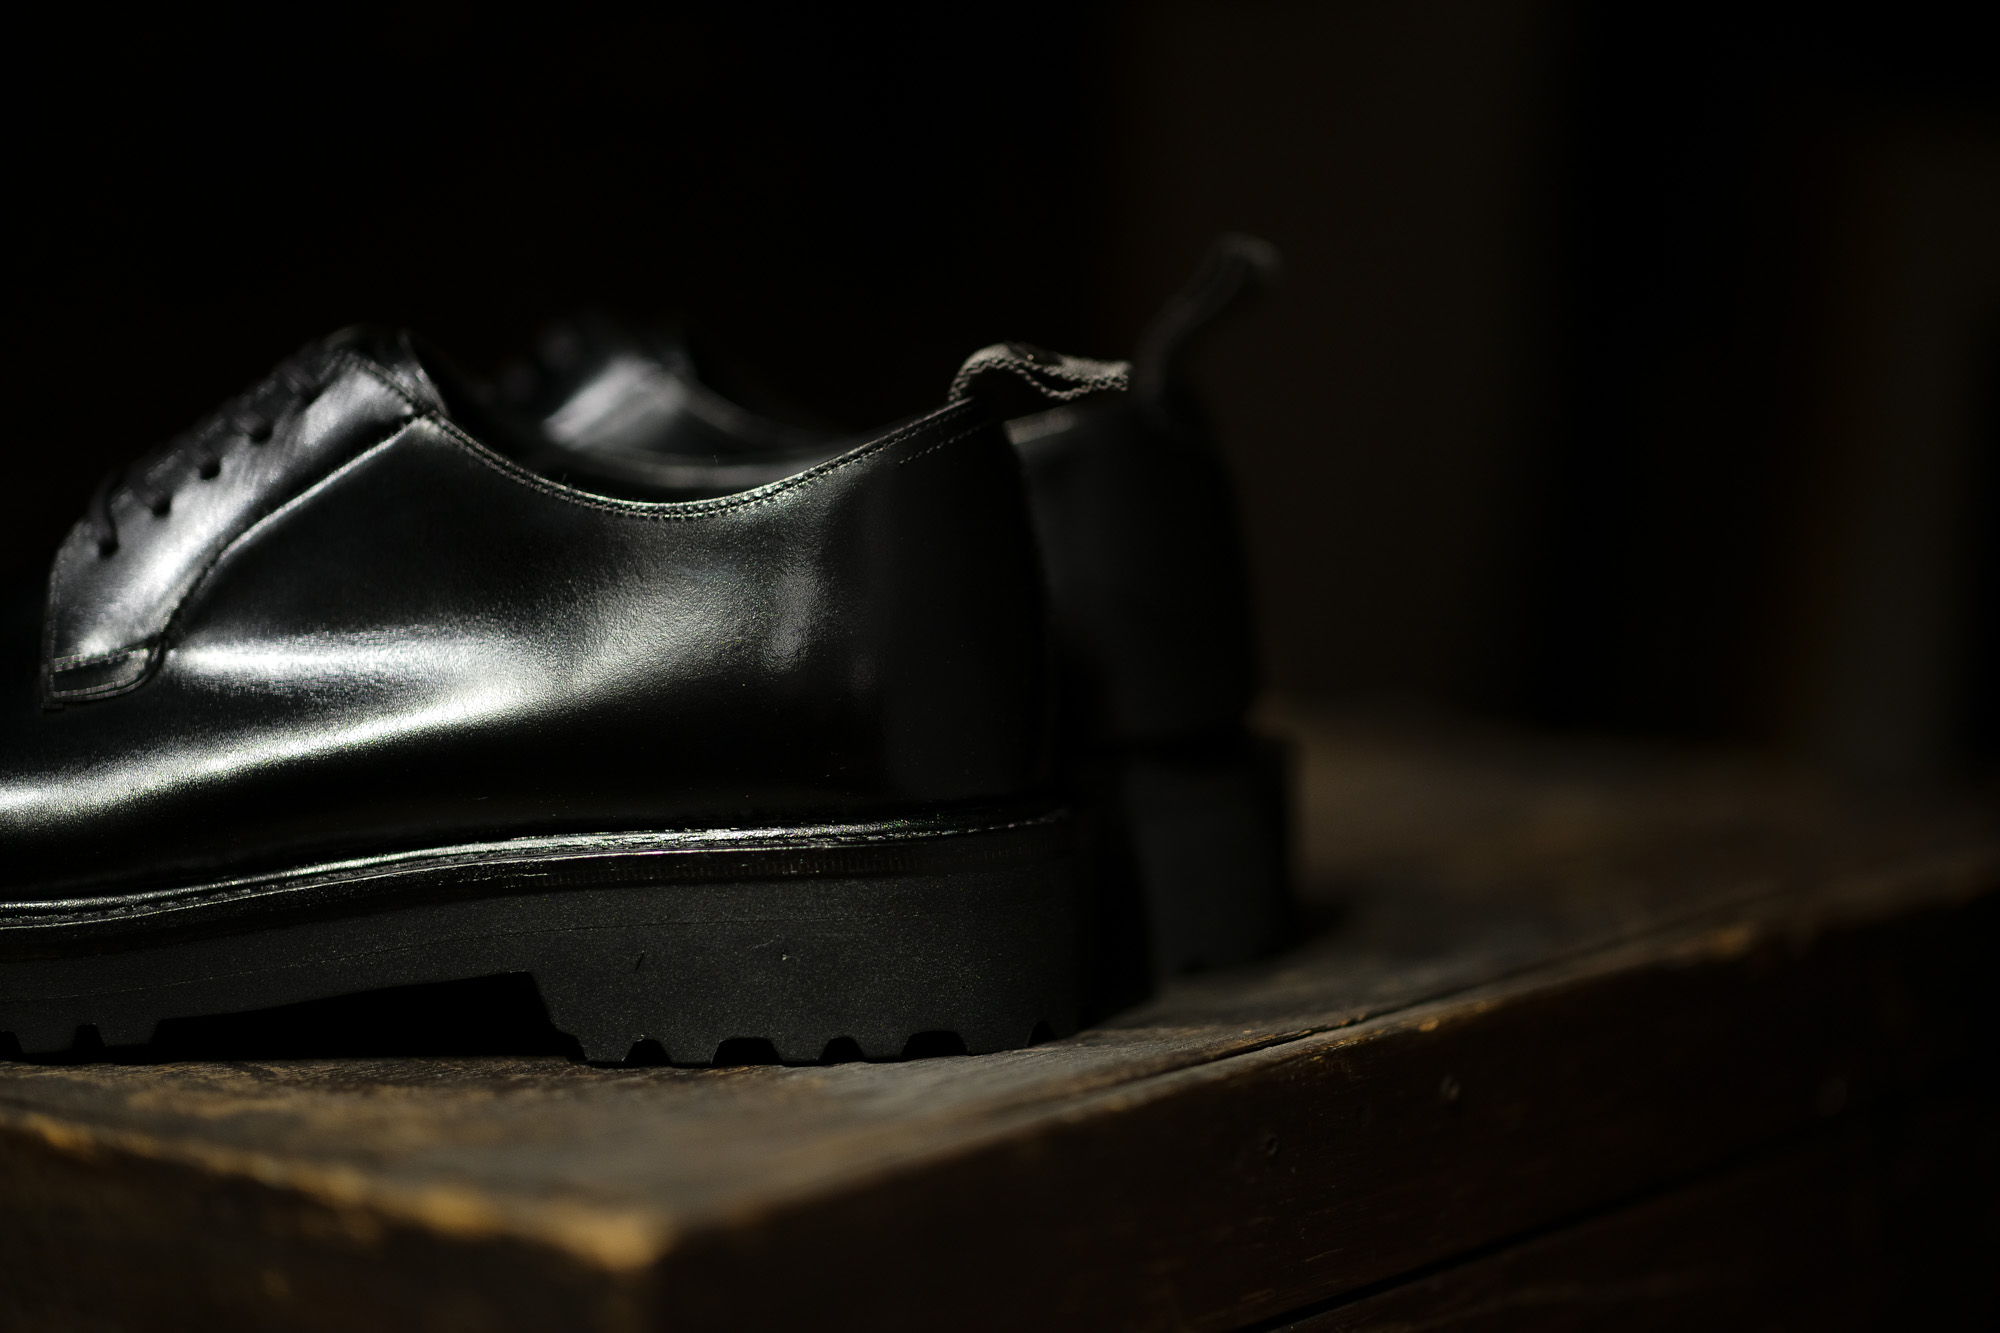 WH (ダブルエイチ) WHS-0010 Plane Toe Shoes (干場氏 スペシャル) Birdie Last (バーディラスト) ANNONAY Vocalou Calf Leather プレーントゥシューズ BLACK (ブラック) MADE IN JAPAN (日本製) 2020 愛知 名古屋 alto e diritto altoediritto アルトエデリット